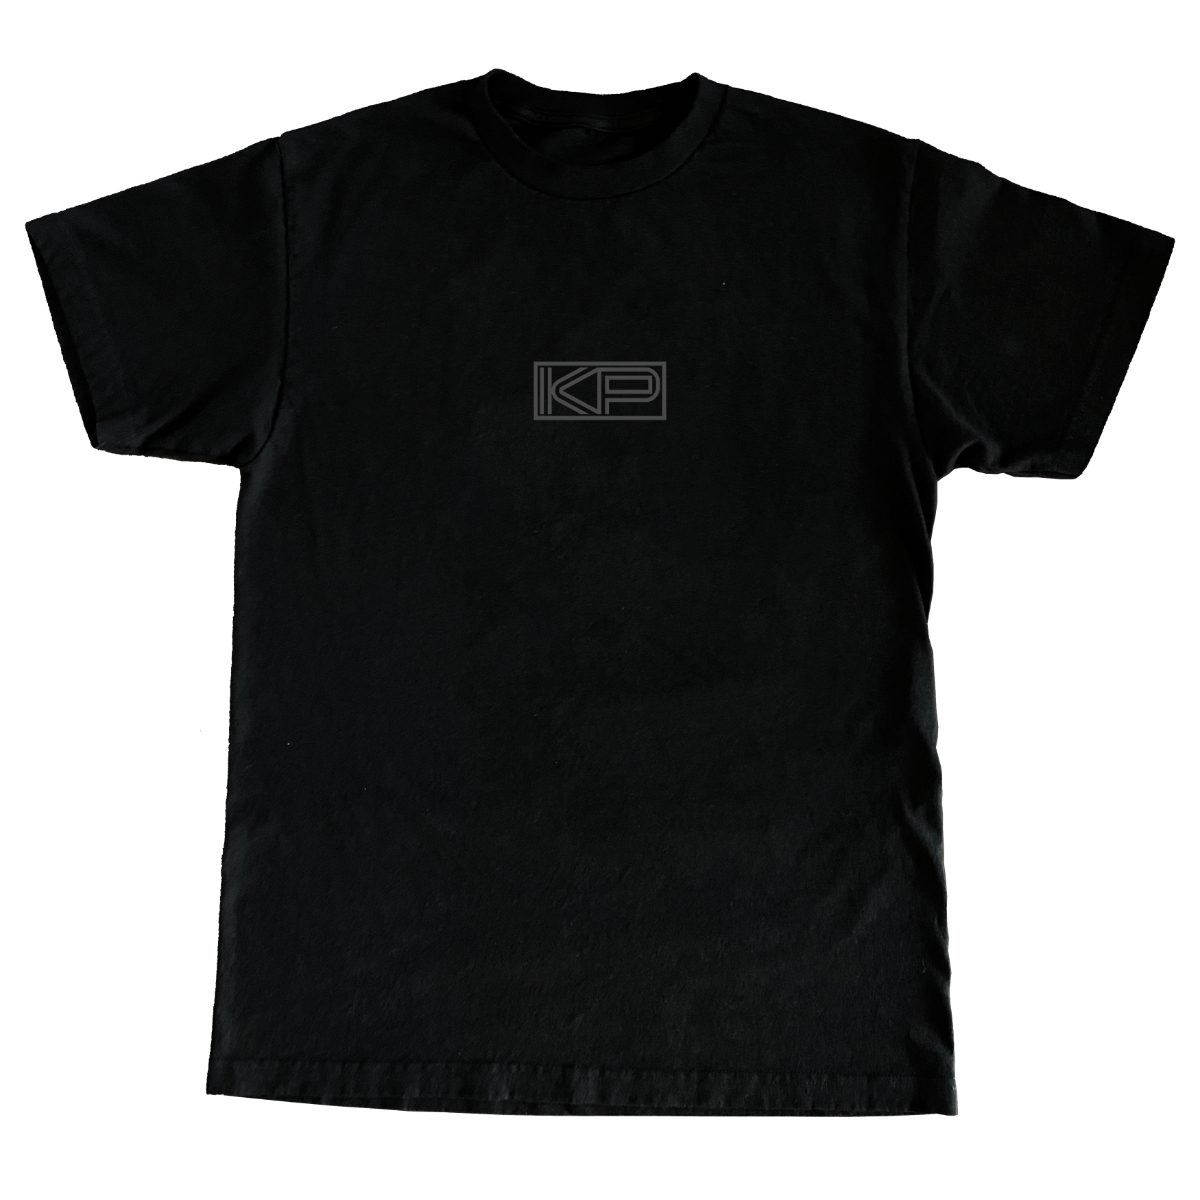 KP Logo Black Tee